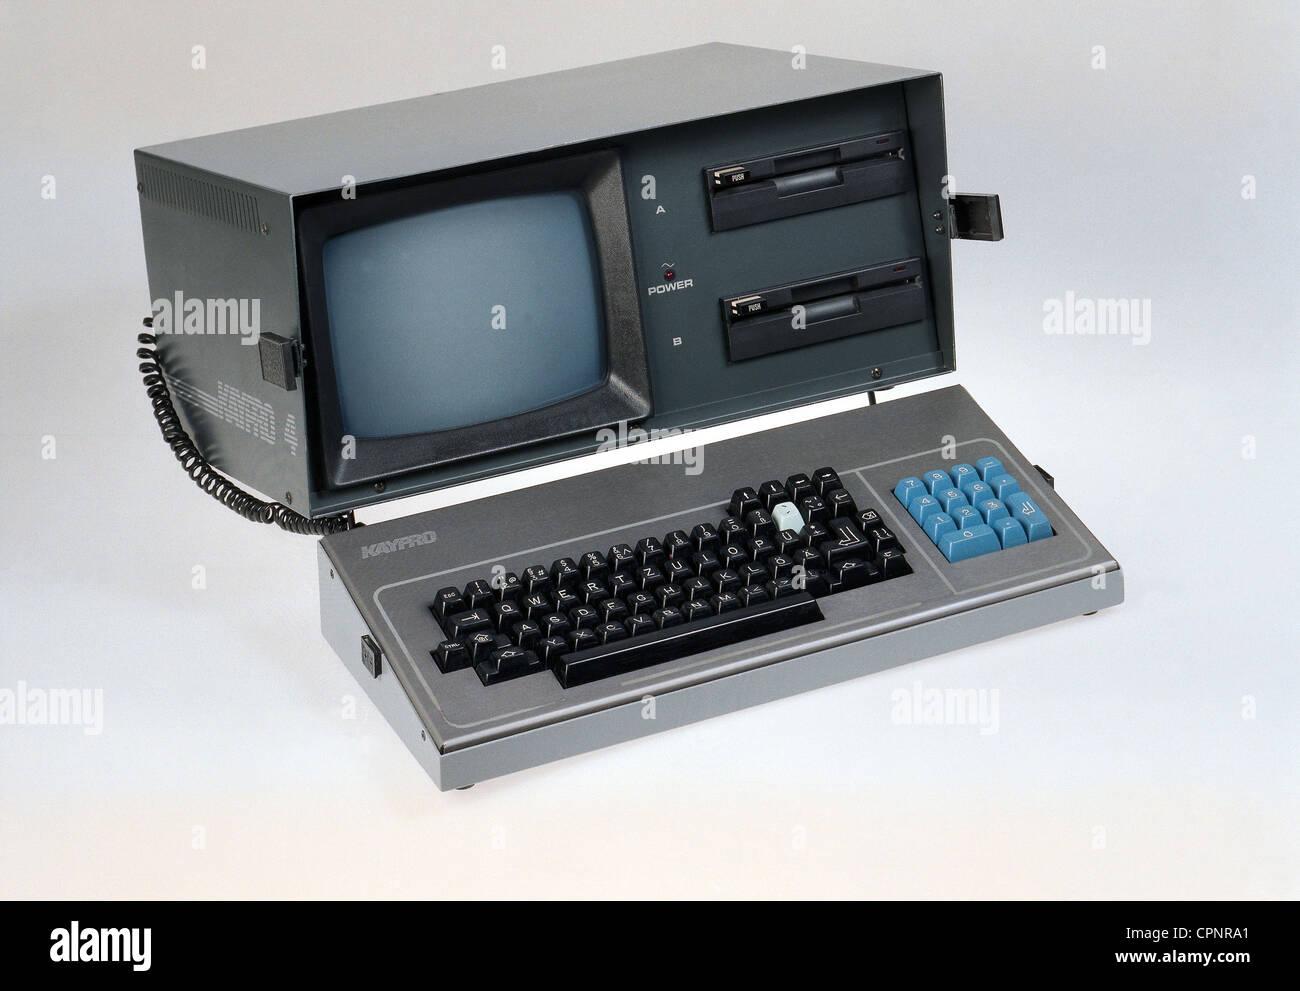 computing / electronics, computer, portable personal